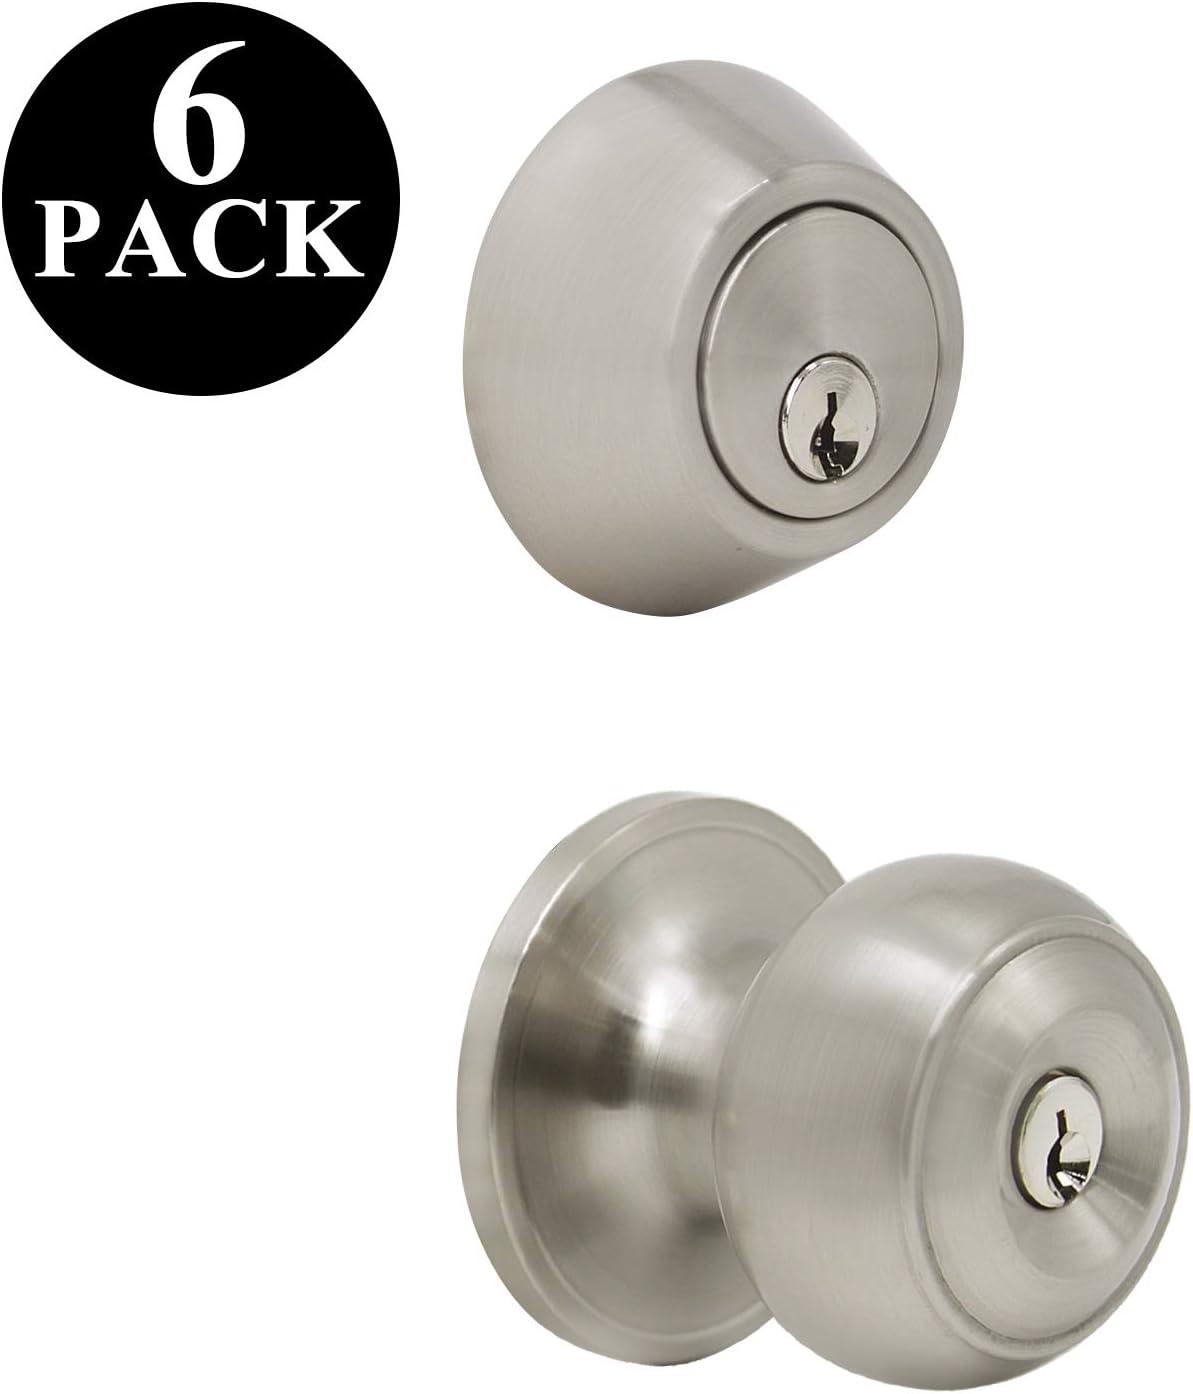 Probrico 10 Sets of Front Exterior Door Knob Set with Single Cylinder Deadbolts in Satin Nickel Finish,Keyed Alike